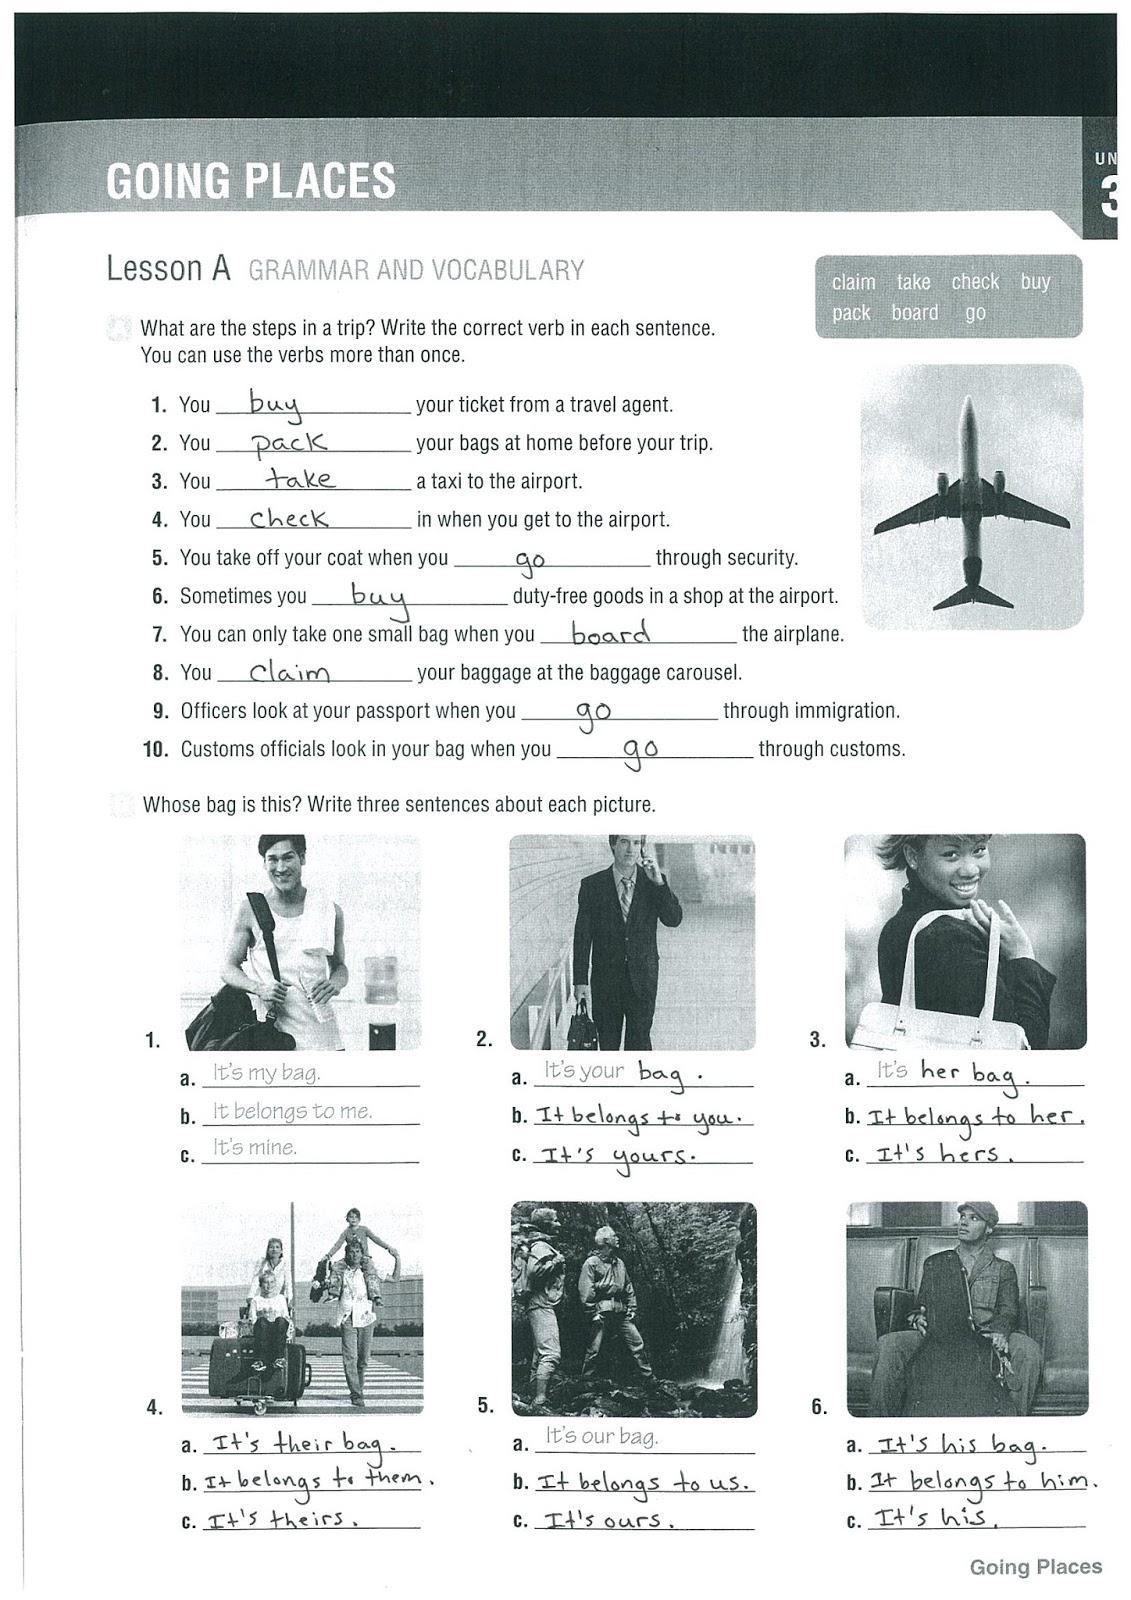 Jiu Fundamentals Of English I Unit 3 Vocabulary List And